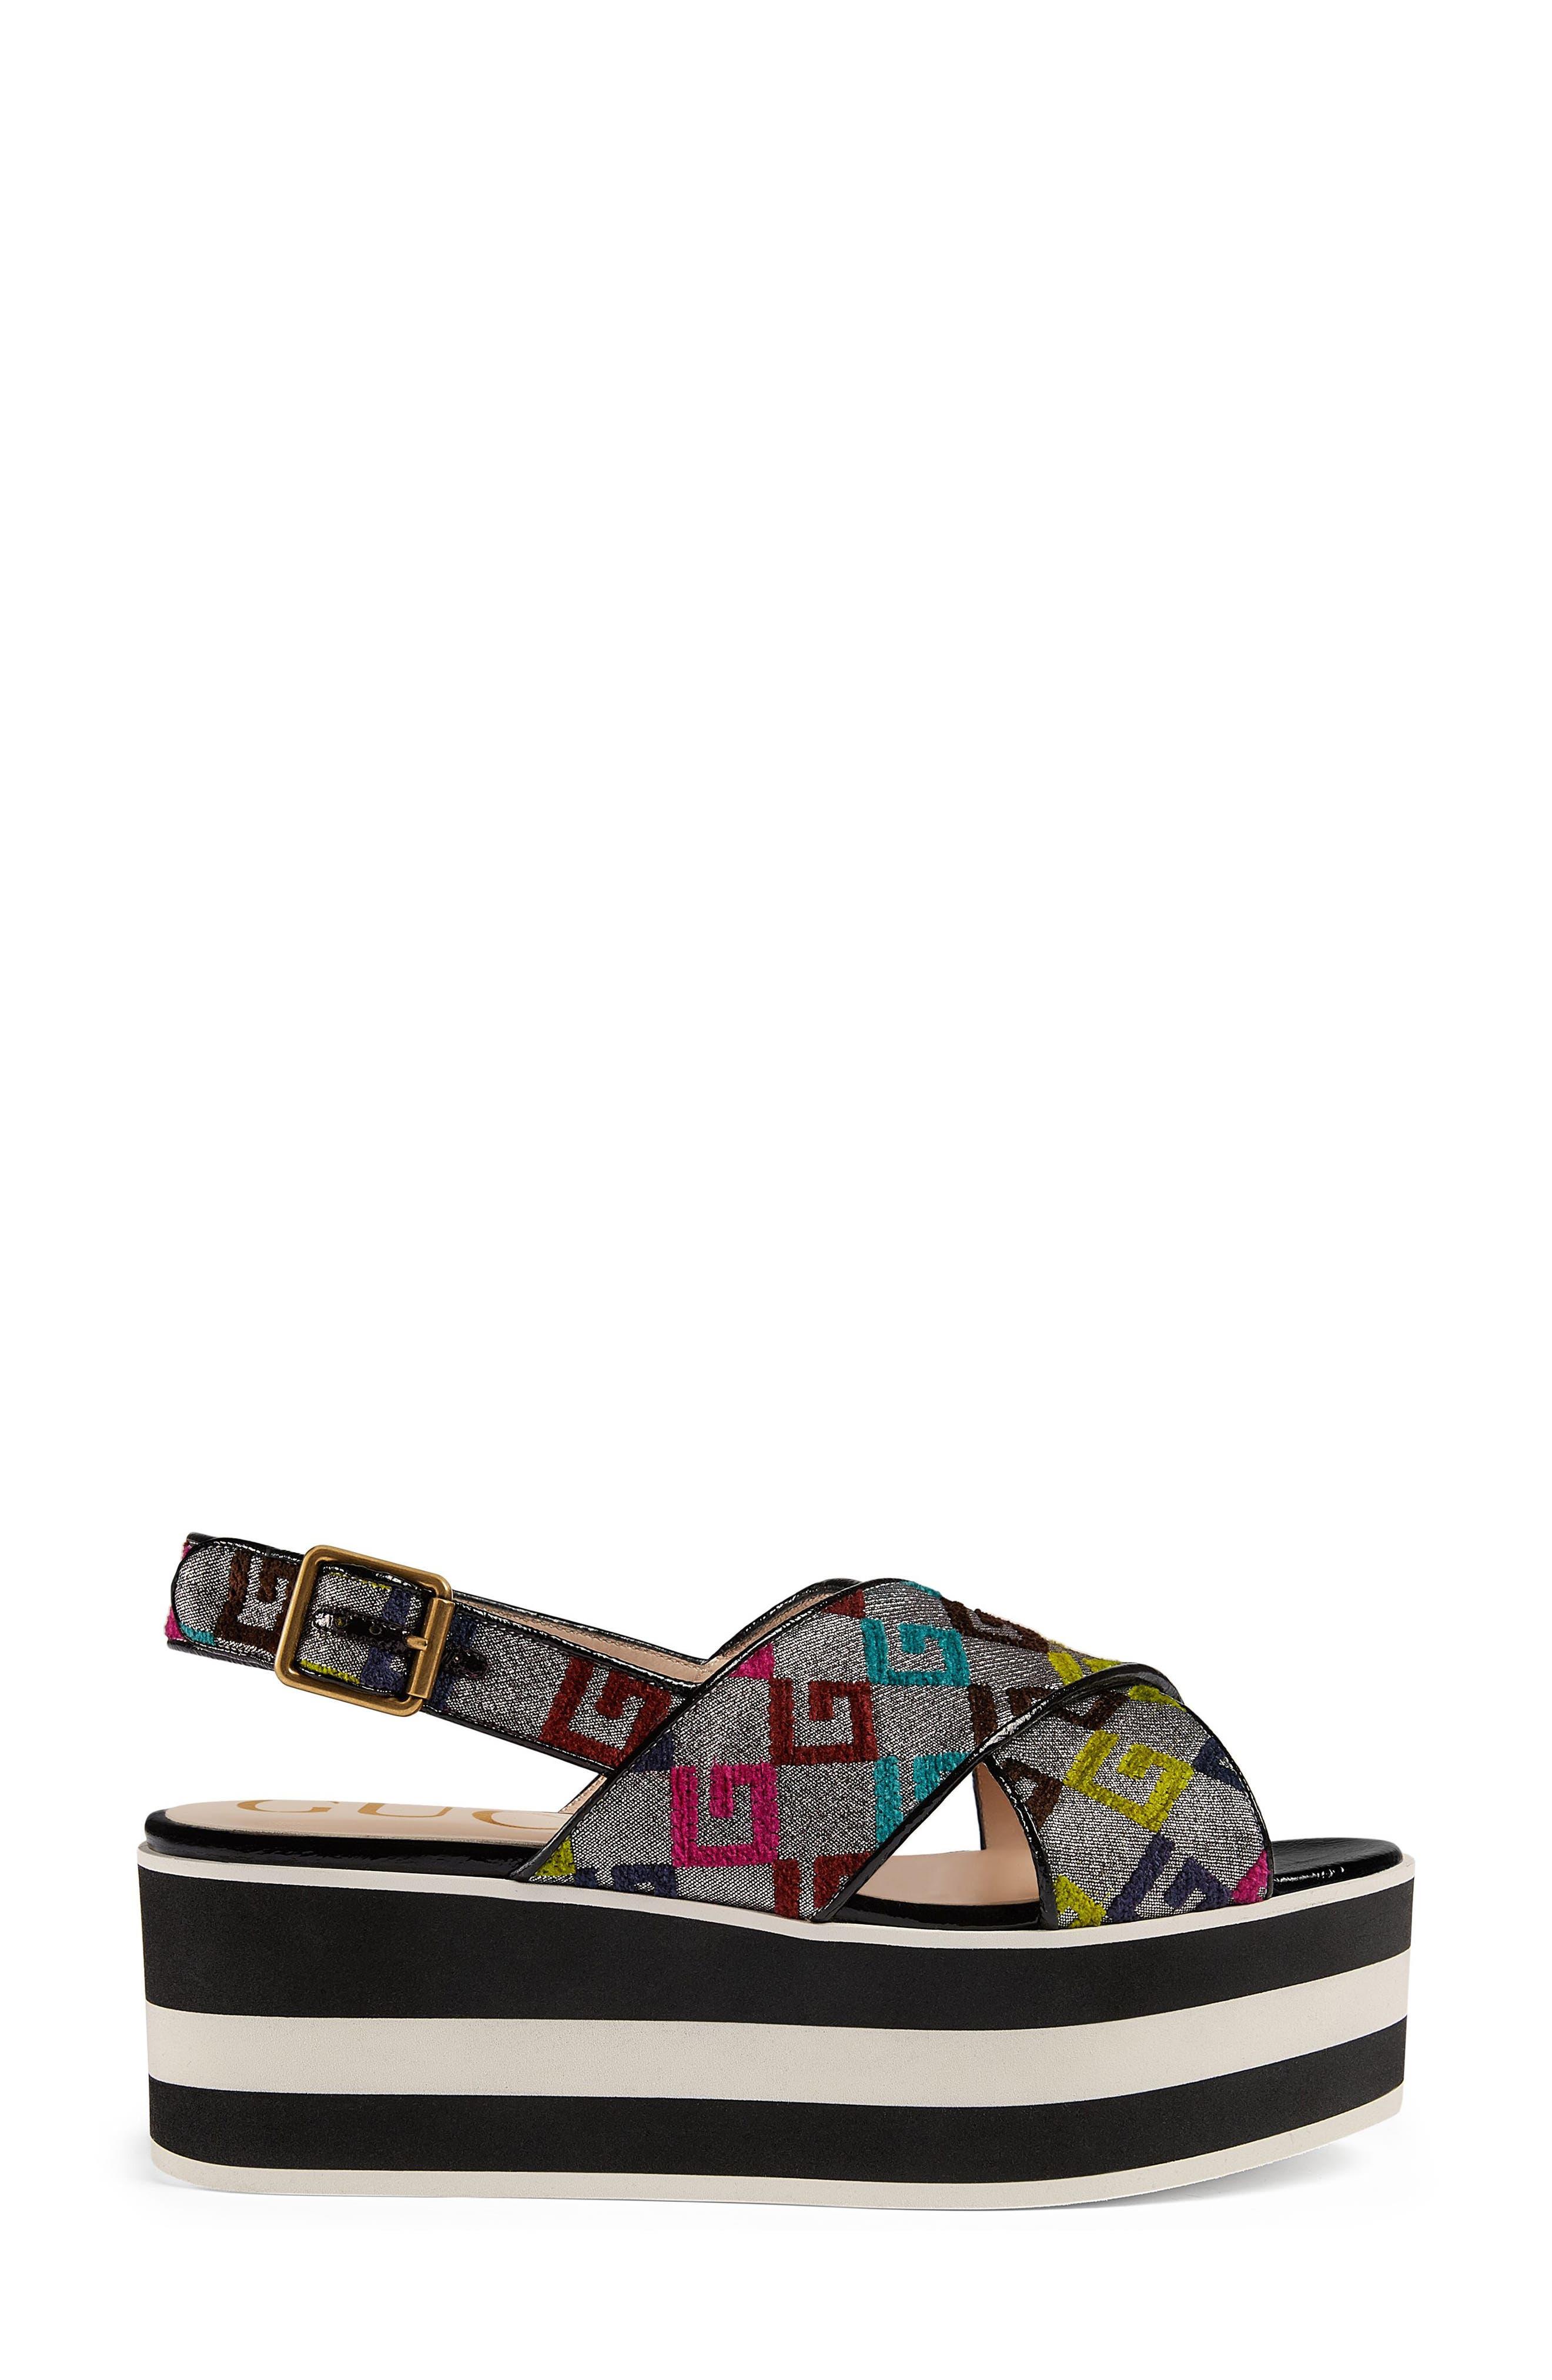 Peggy Flatform Sandal,                             Alternate thumbnail 2, color,                             047